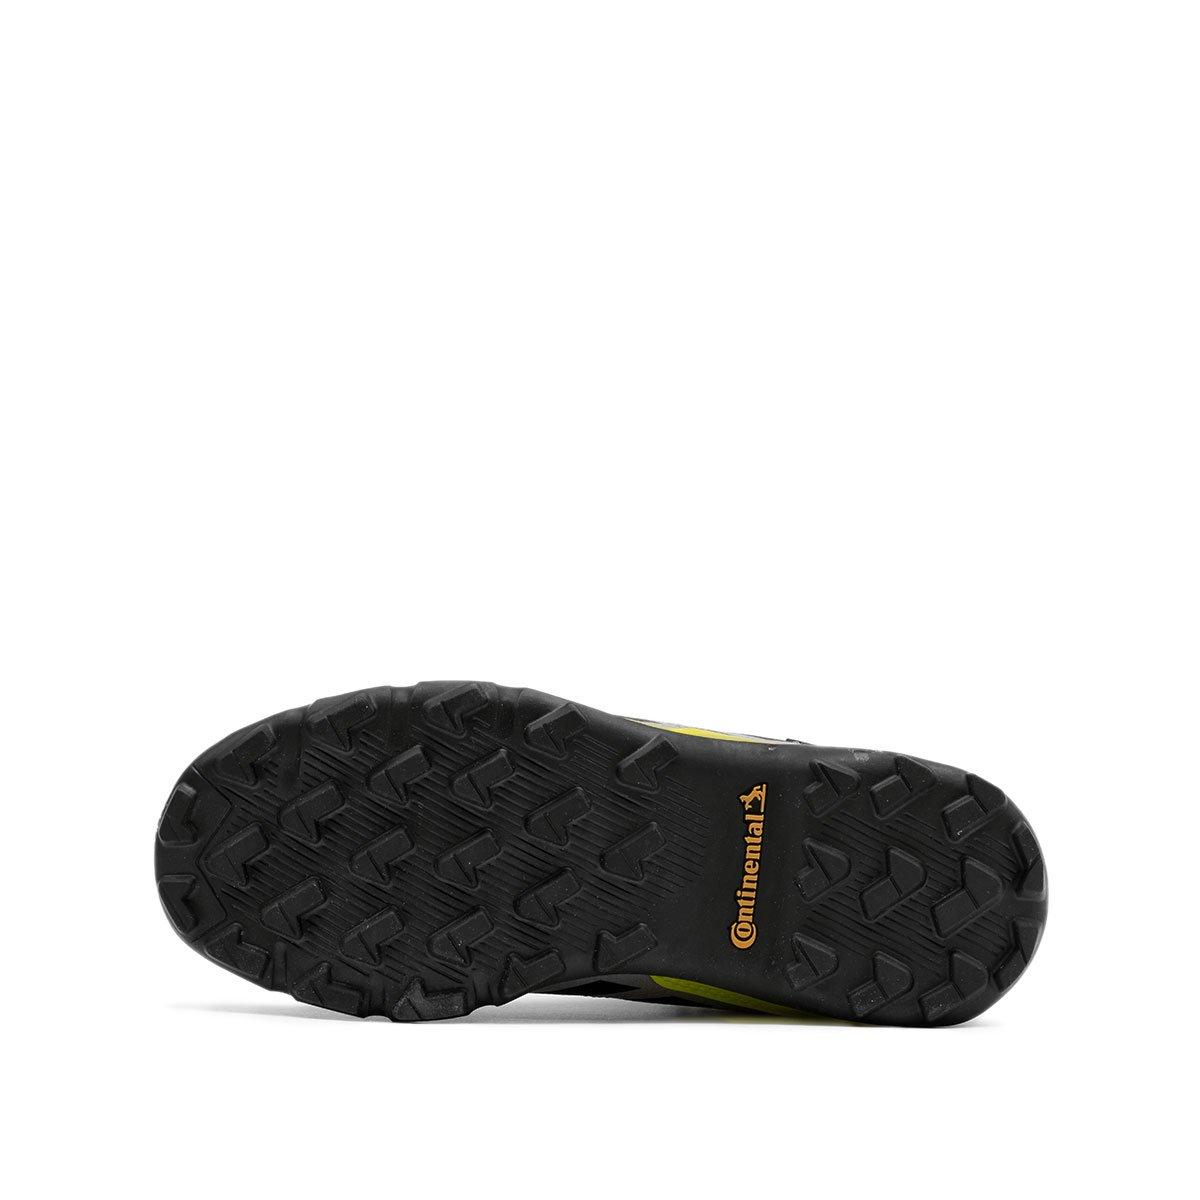 Adidas Terrex Mid Gore-Tex